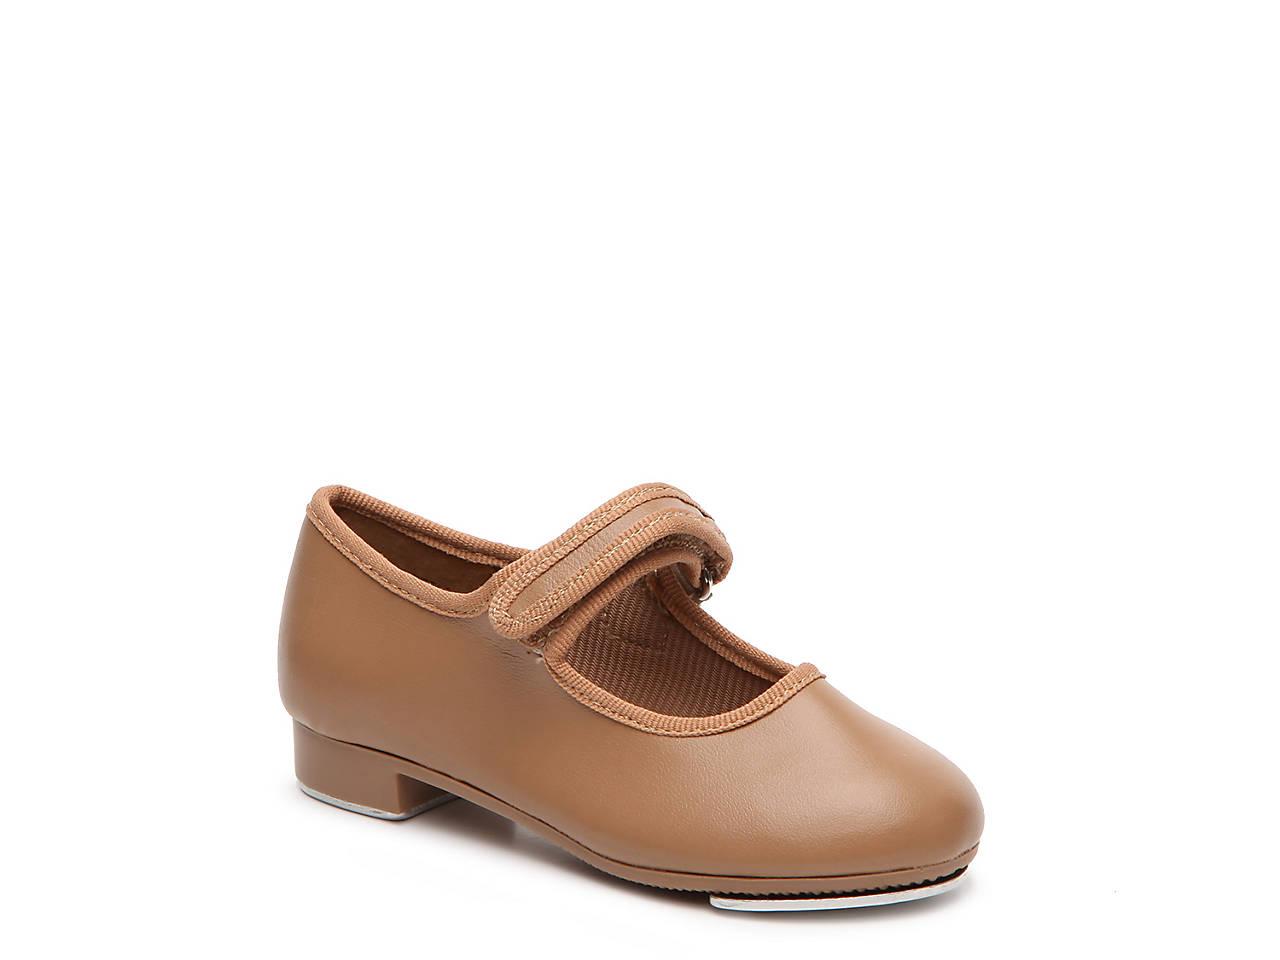 b4a4fd50e666 Dance Class Beginning Toddler Mary Jane Tap Shoe Kids Shoes